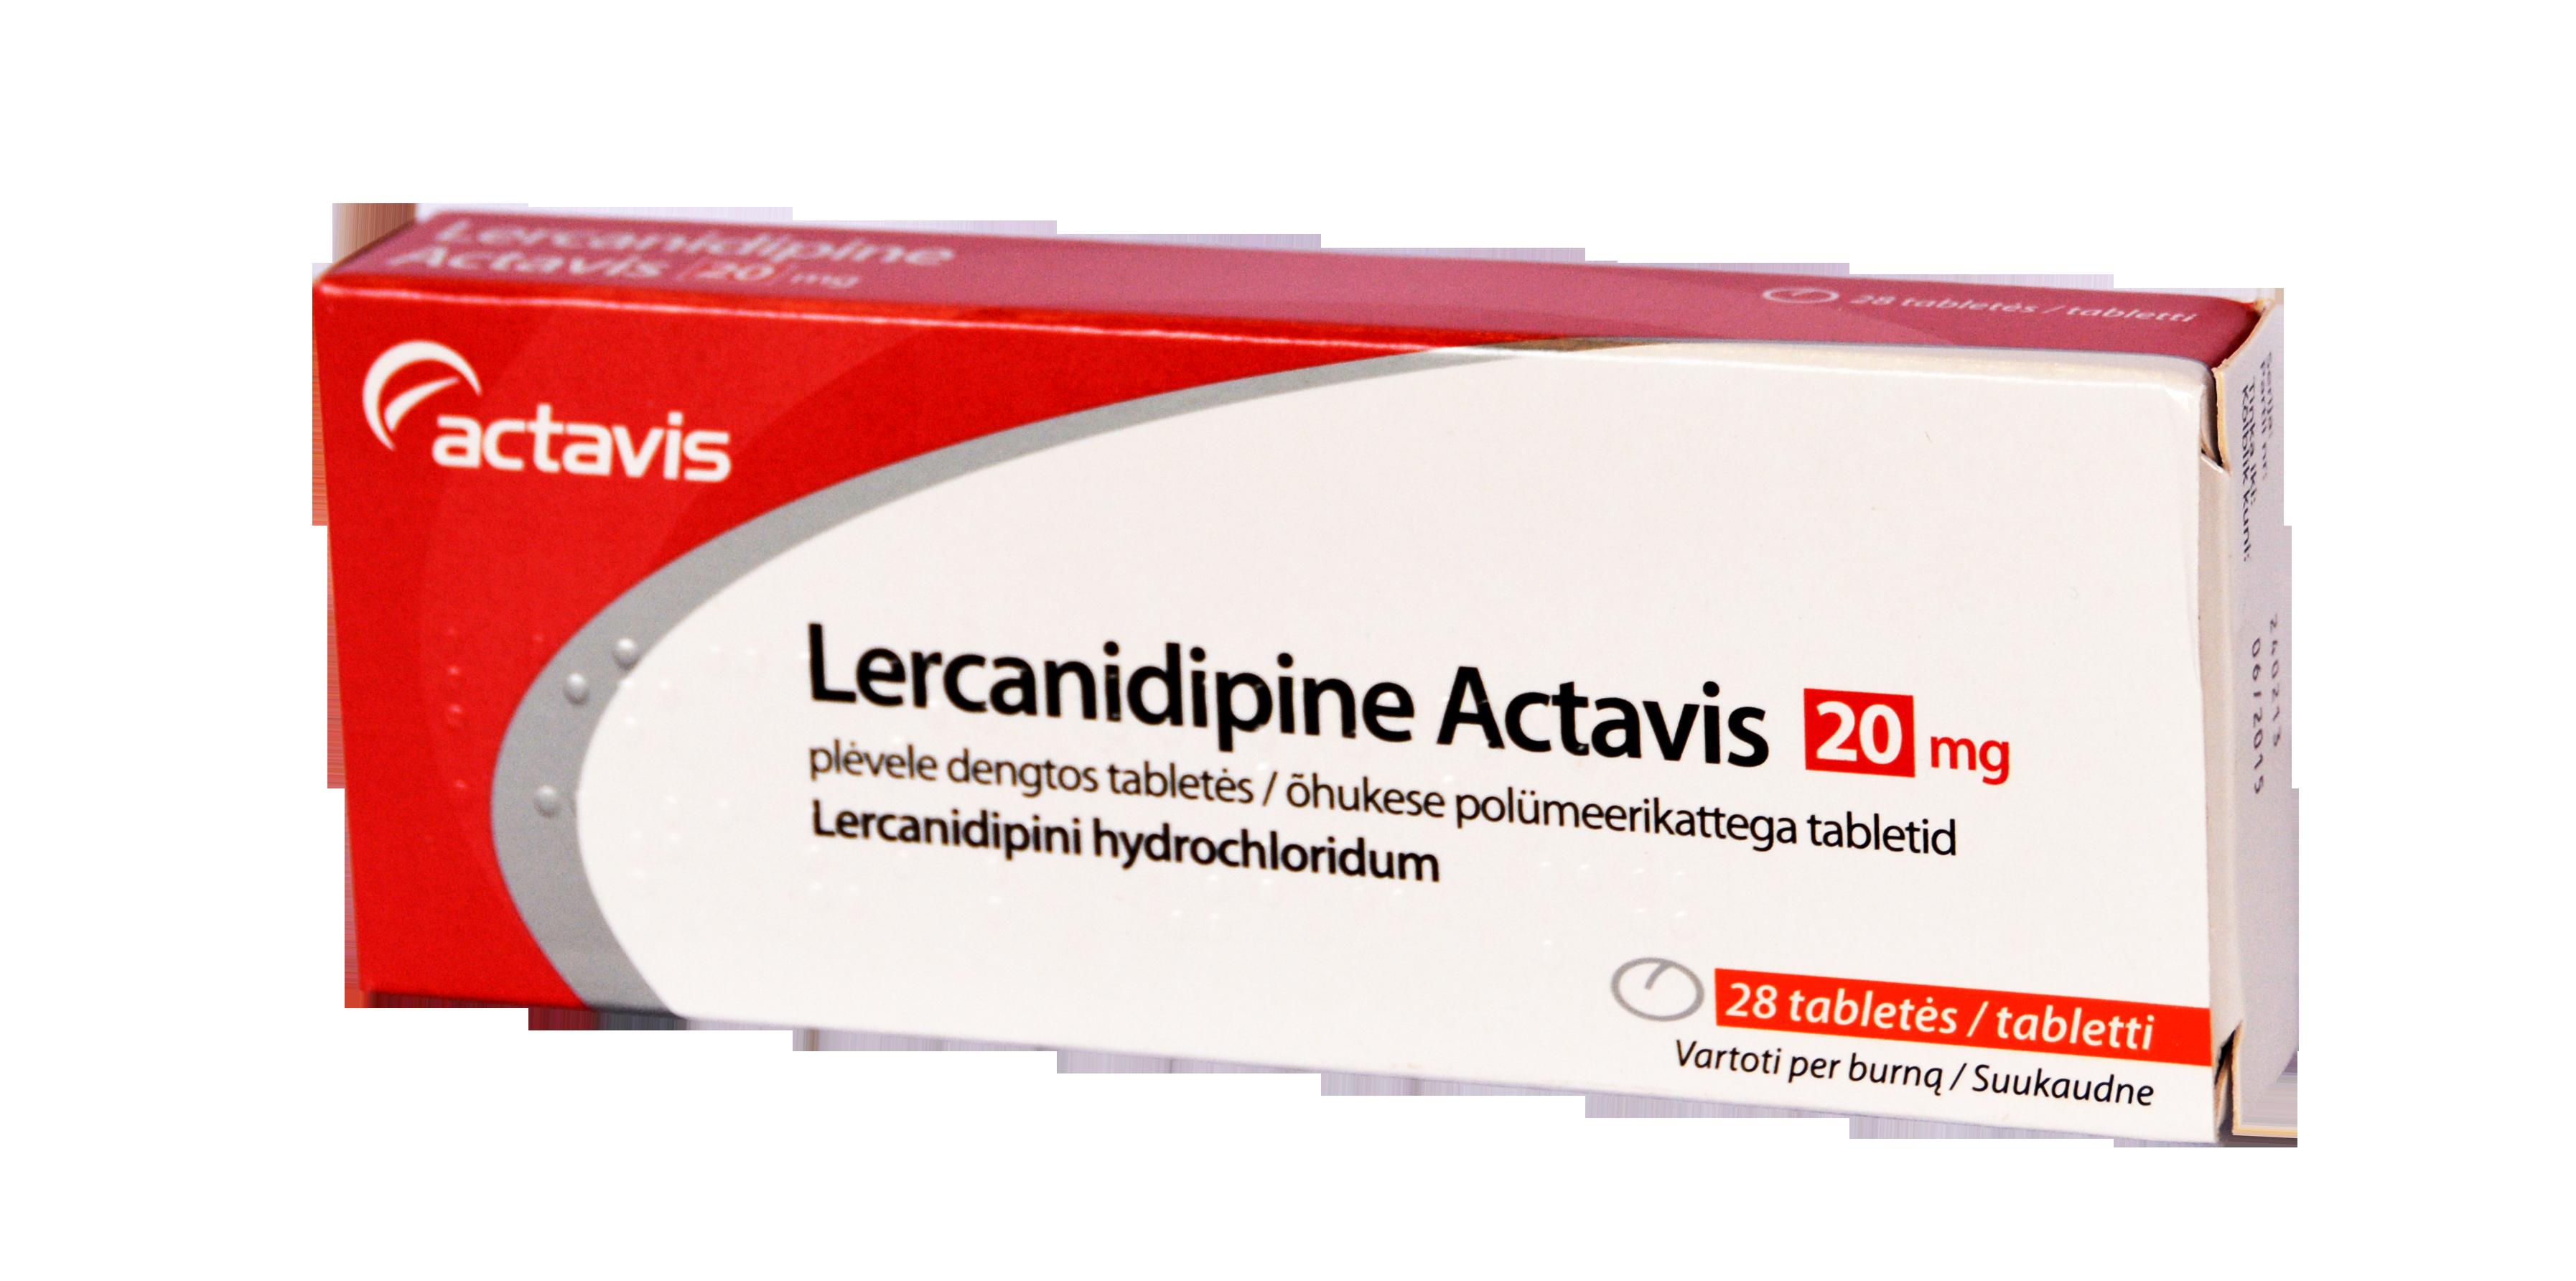 Metoprolol-ratiopharm mg tabletės N30 - taksi-ag.lt